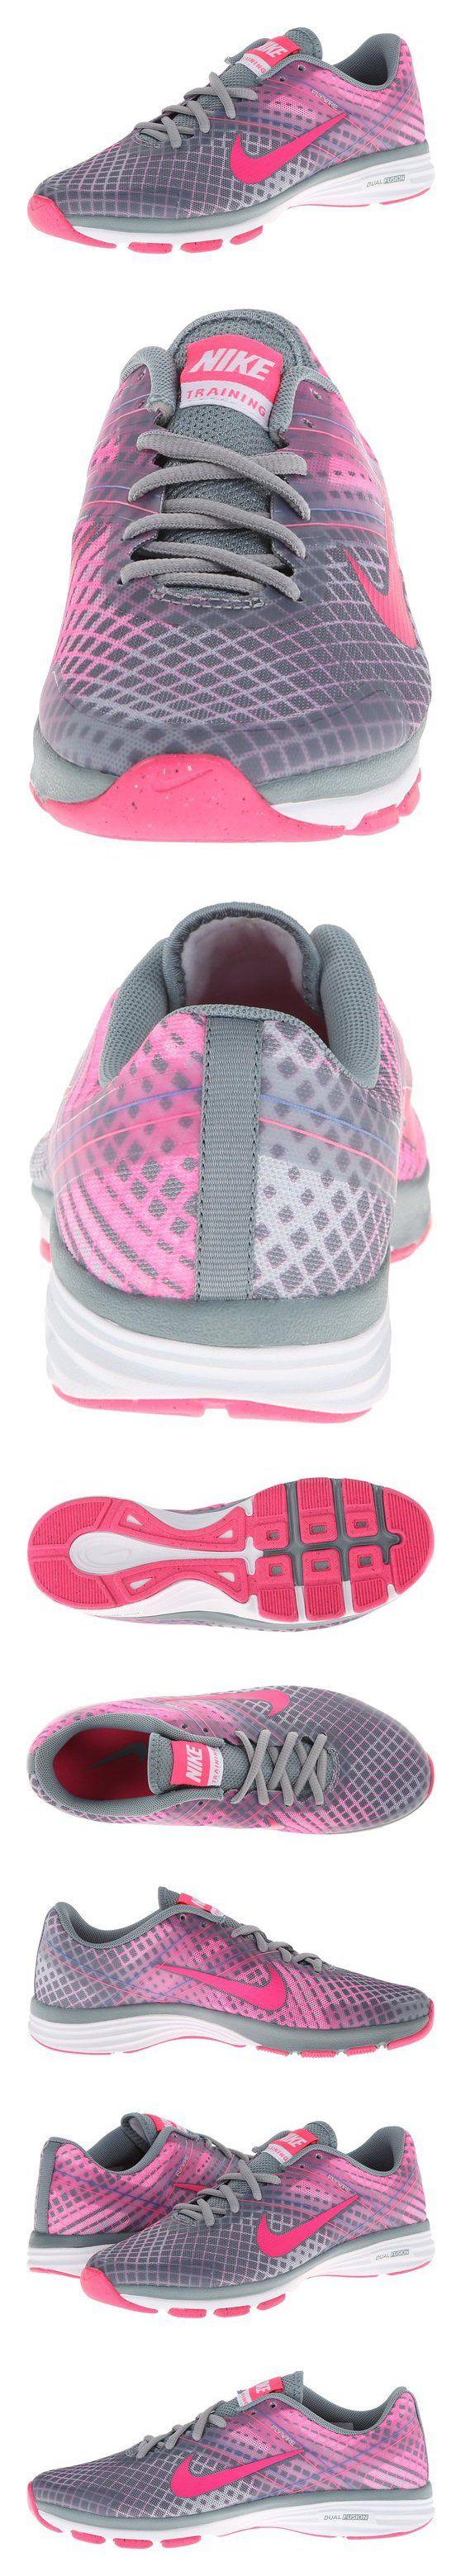 $80 - Nike Women's Dual Fusion Tr 2 Print Avtr Gry/Hypr Pnk/Lght Ash Gry Training Shoe 10 Women US #shoes #nike #2012